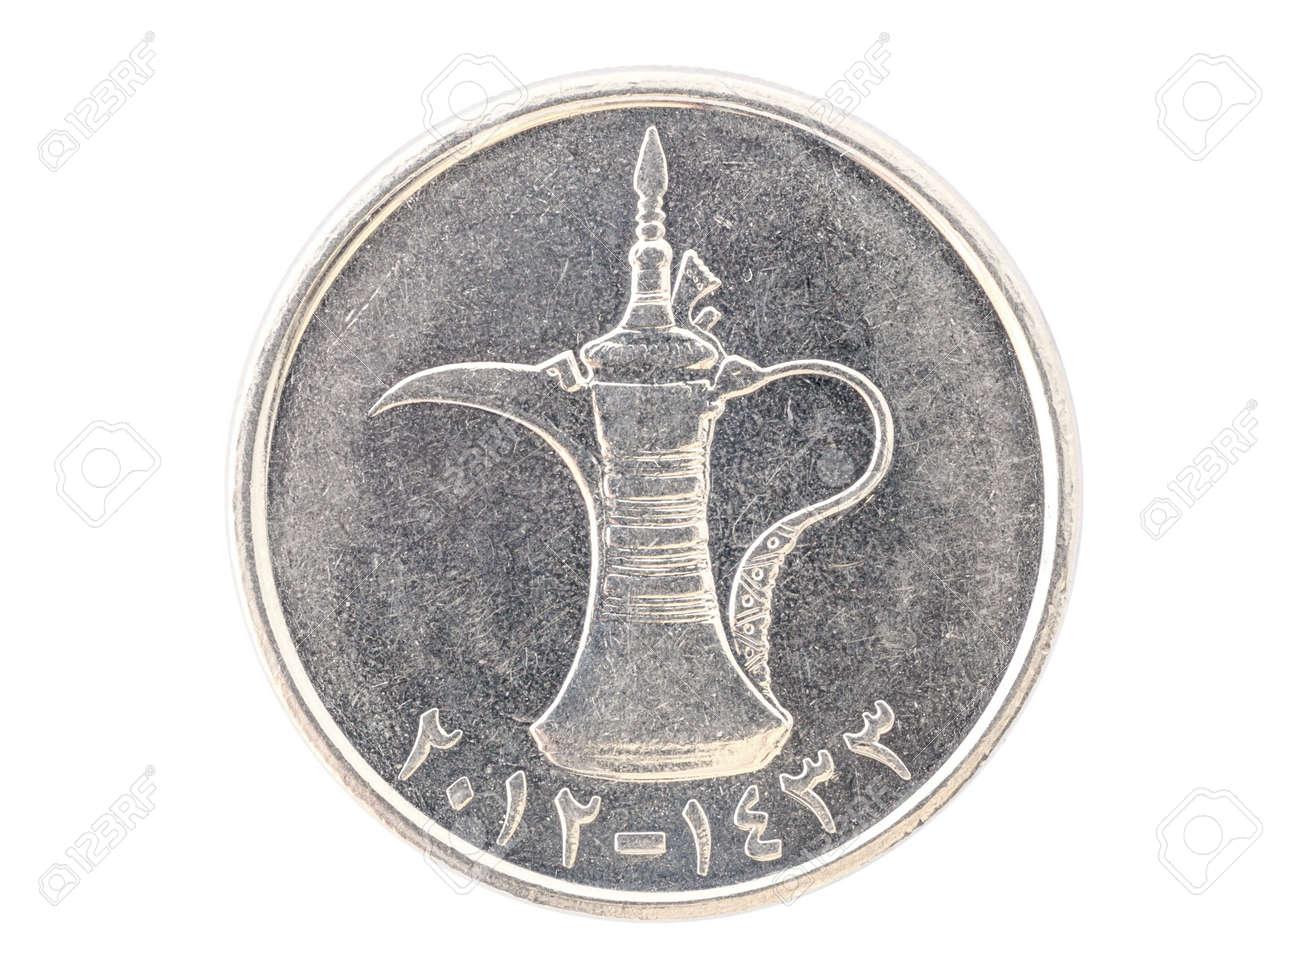 One dirham coin isolated on white stock photo picture and royalty one dirham coin isolated on white stock photo 59597409 biocorpaavc